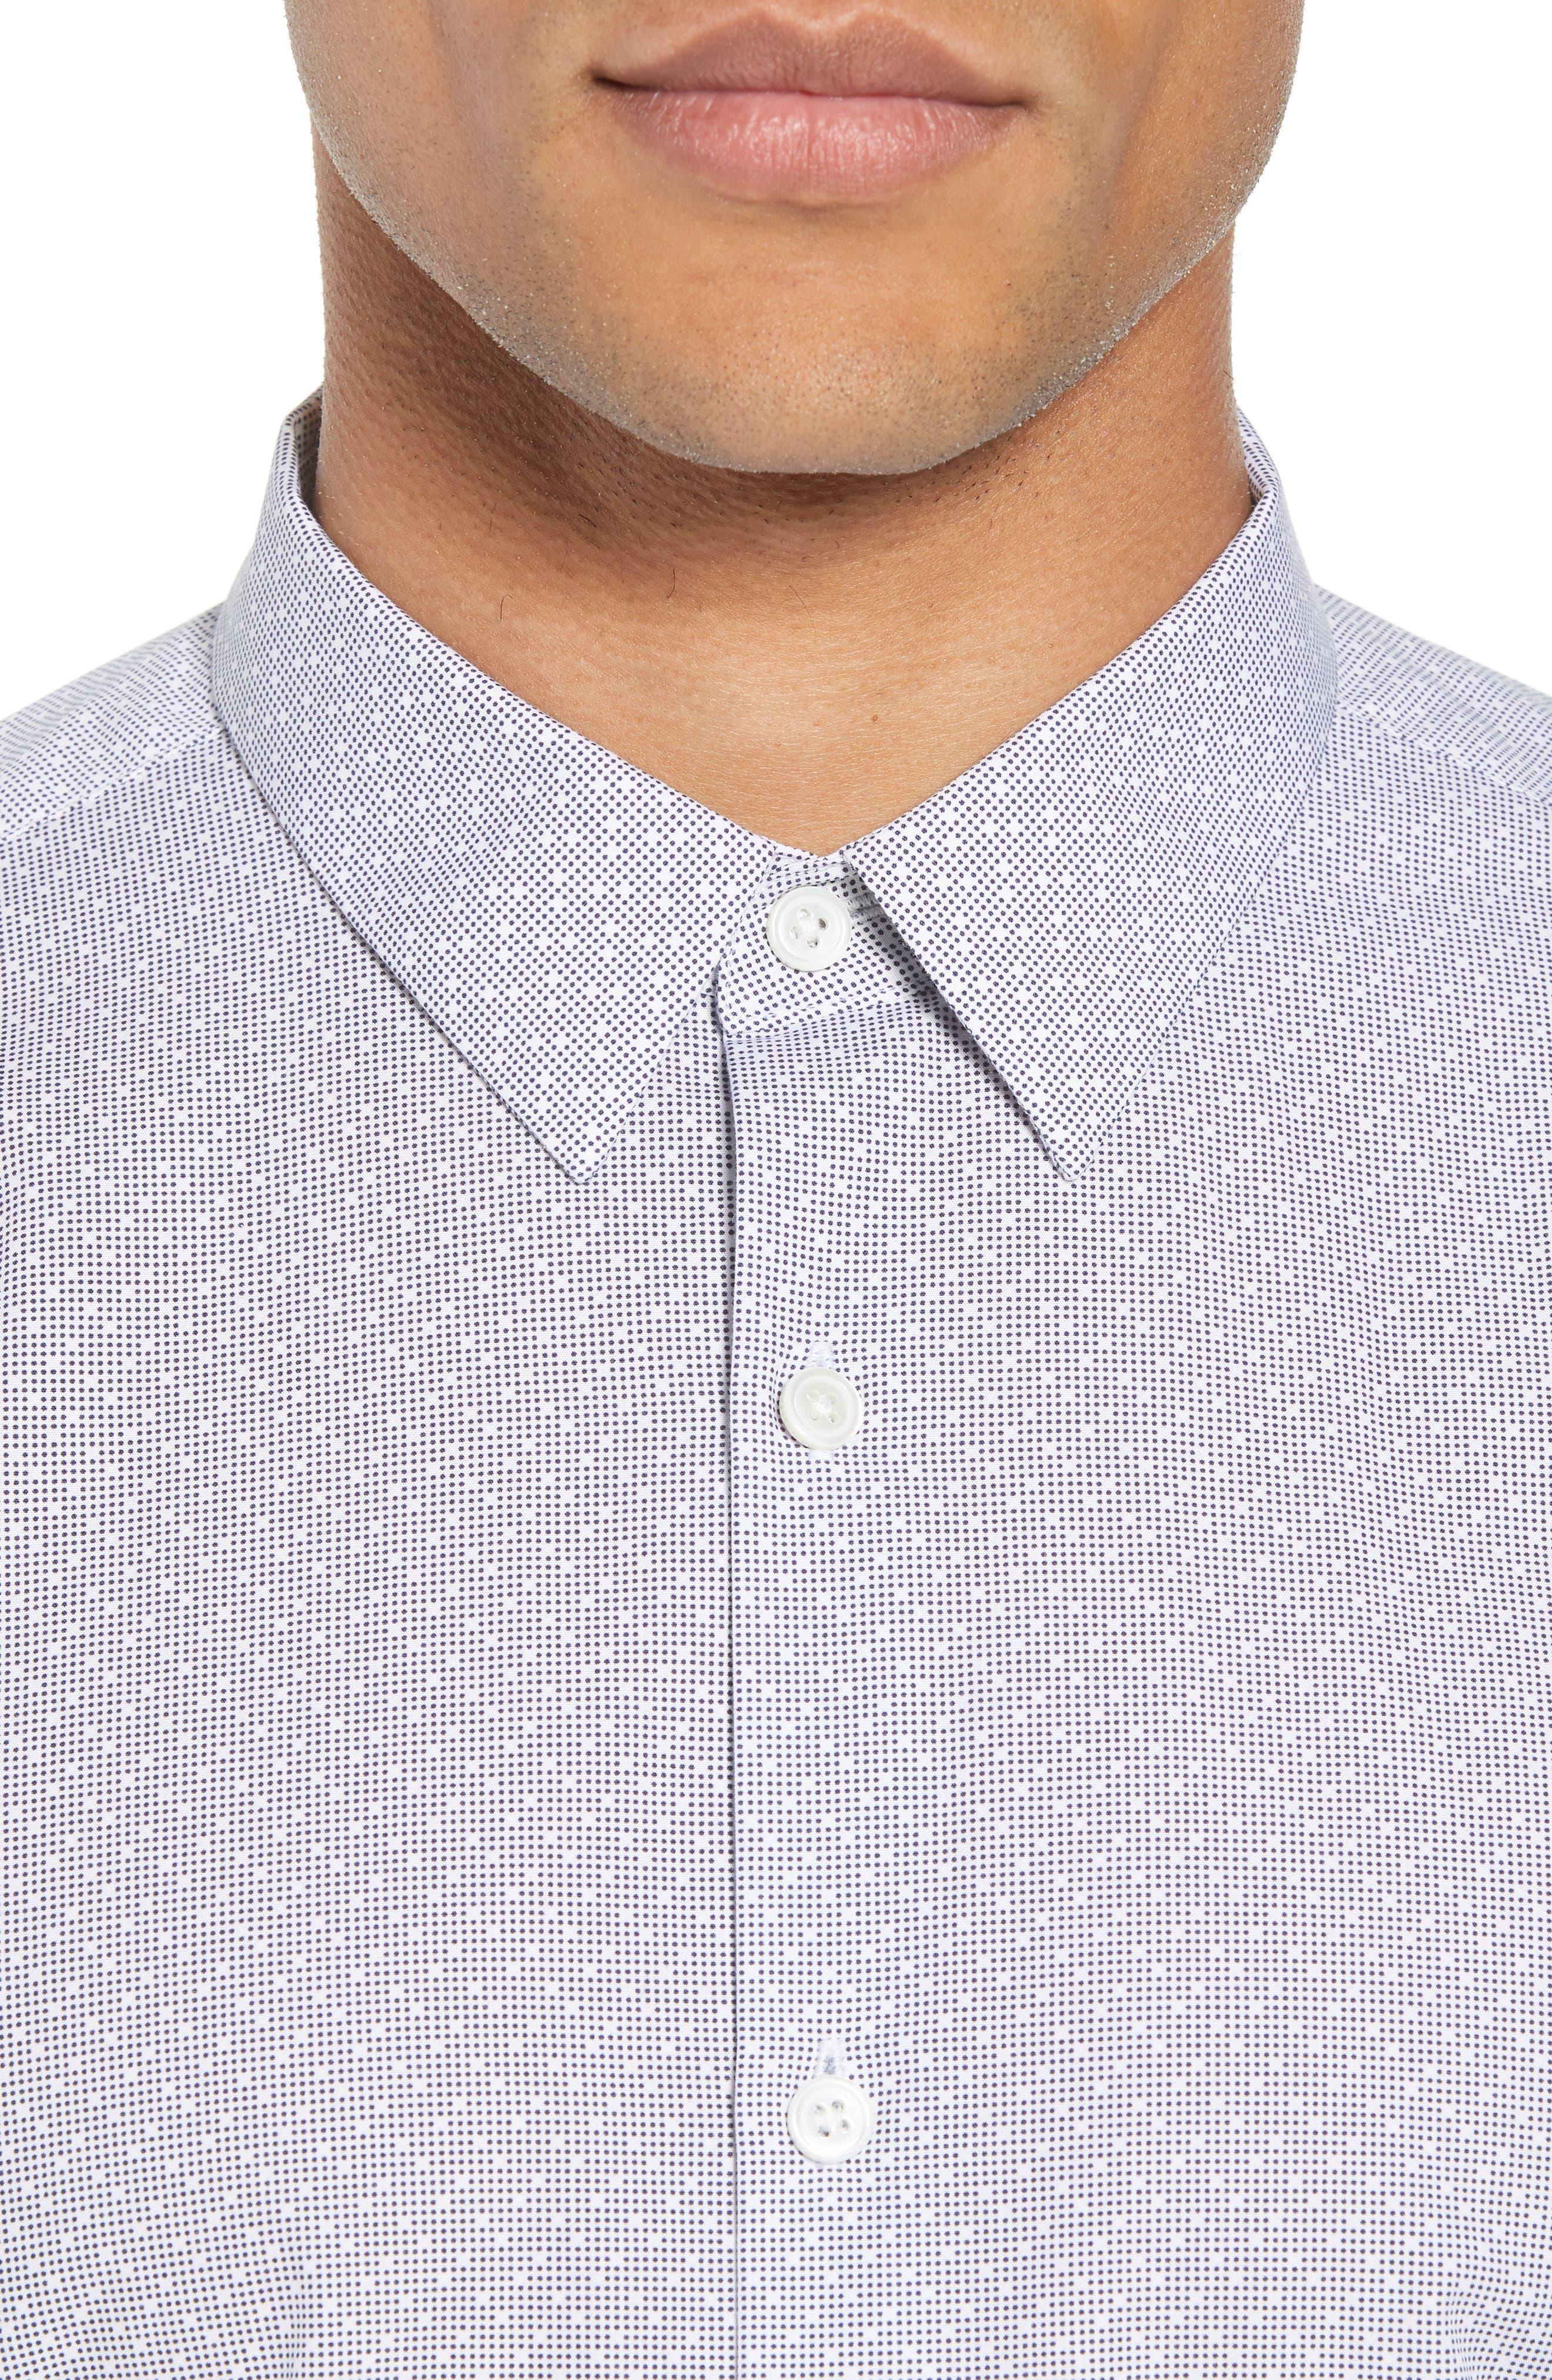 Murray Trim Fit Pixel Print Sport Shirt,                             Alternate thumbnail 2, color,                             Eclipse Multi